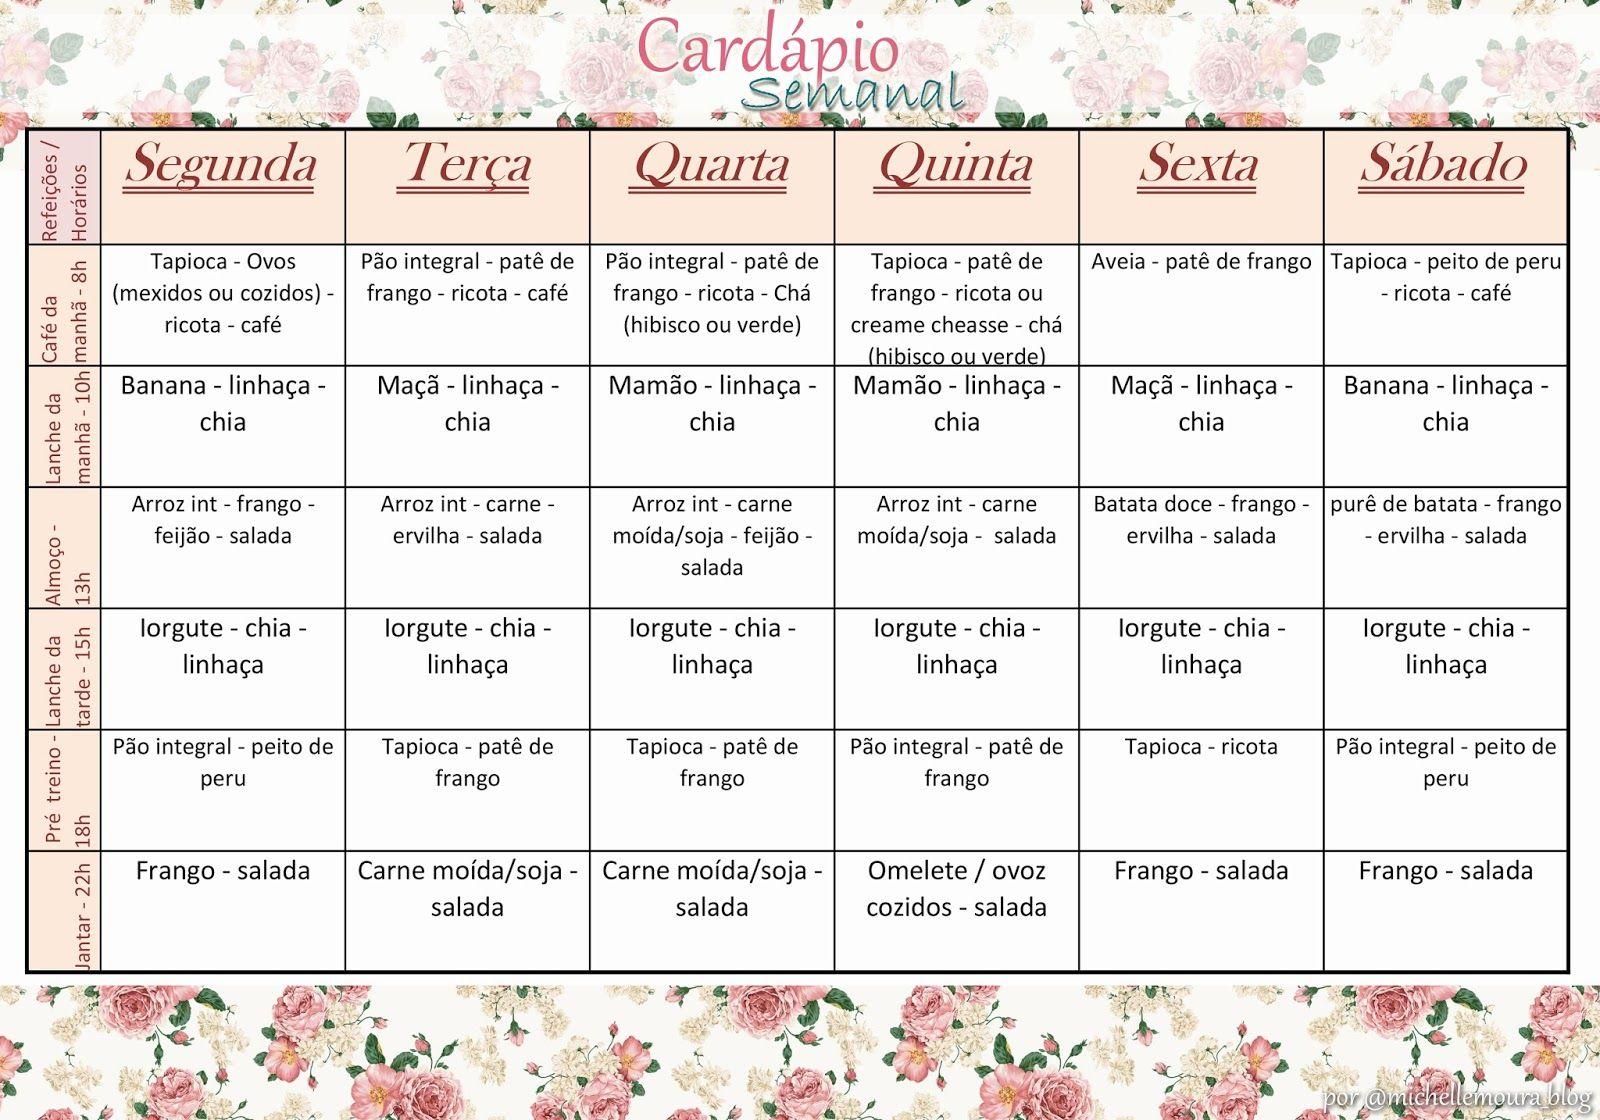 Cardapio Semanal Download Michelle Moura Cardapio Semanal